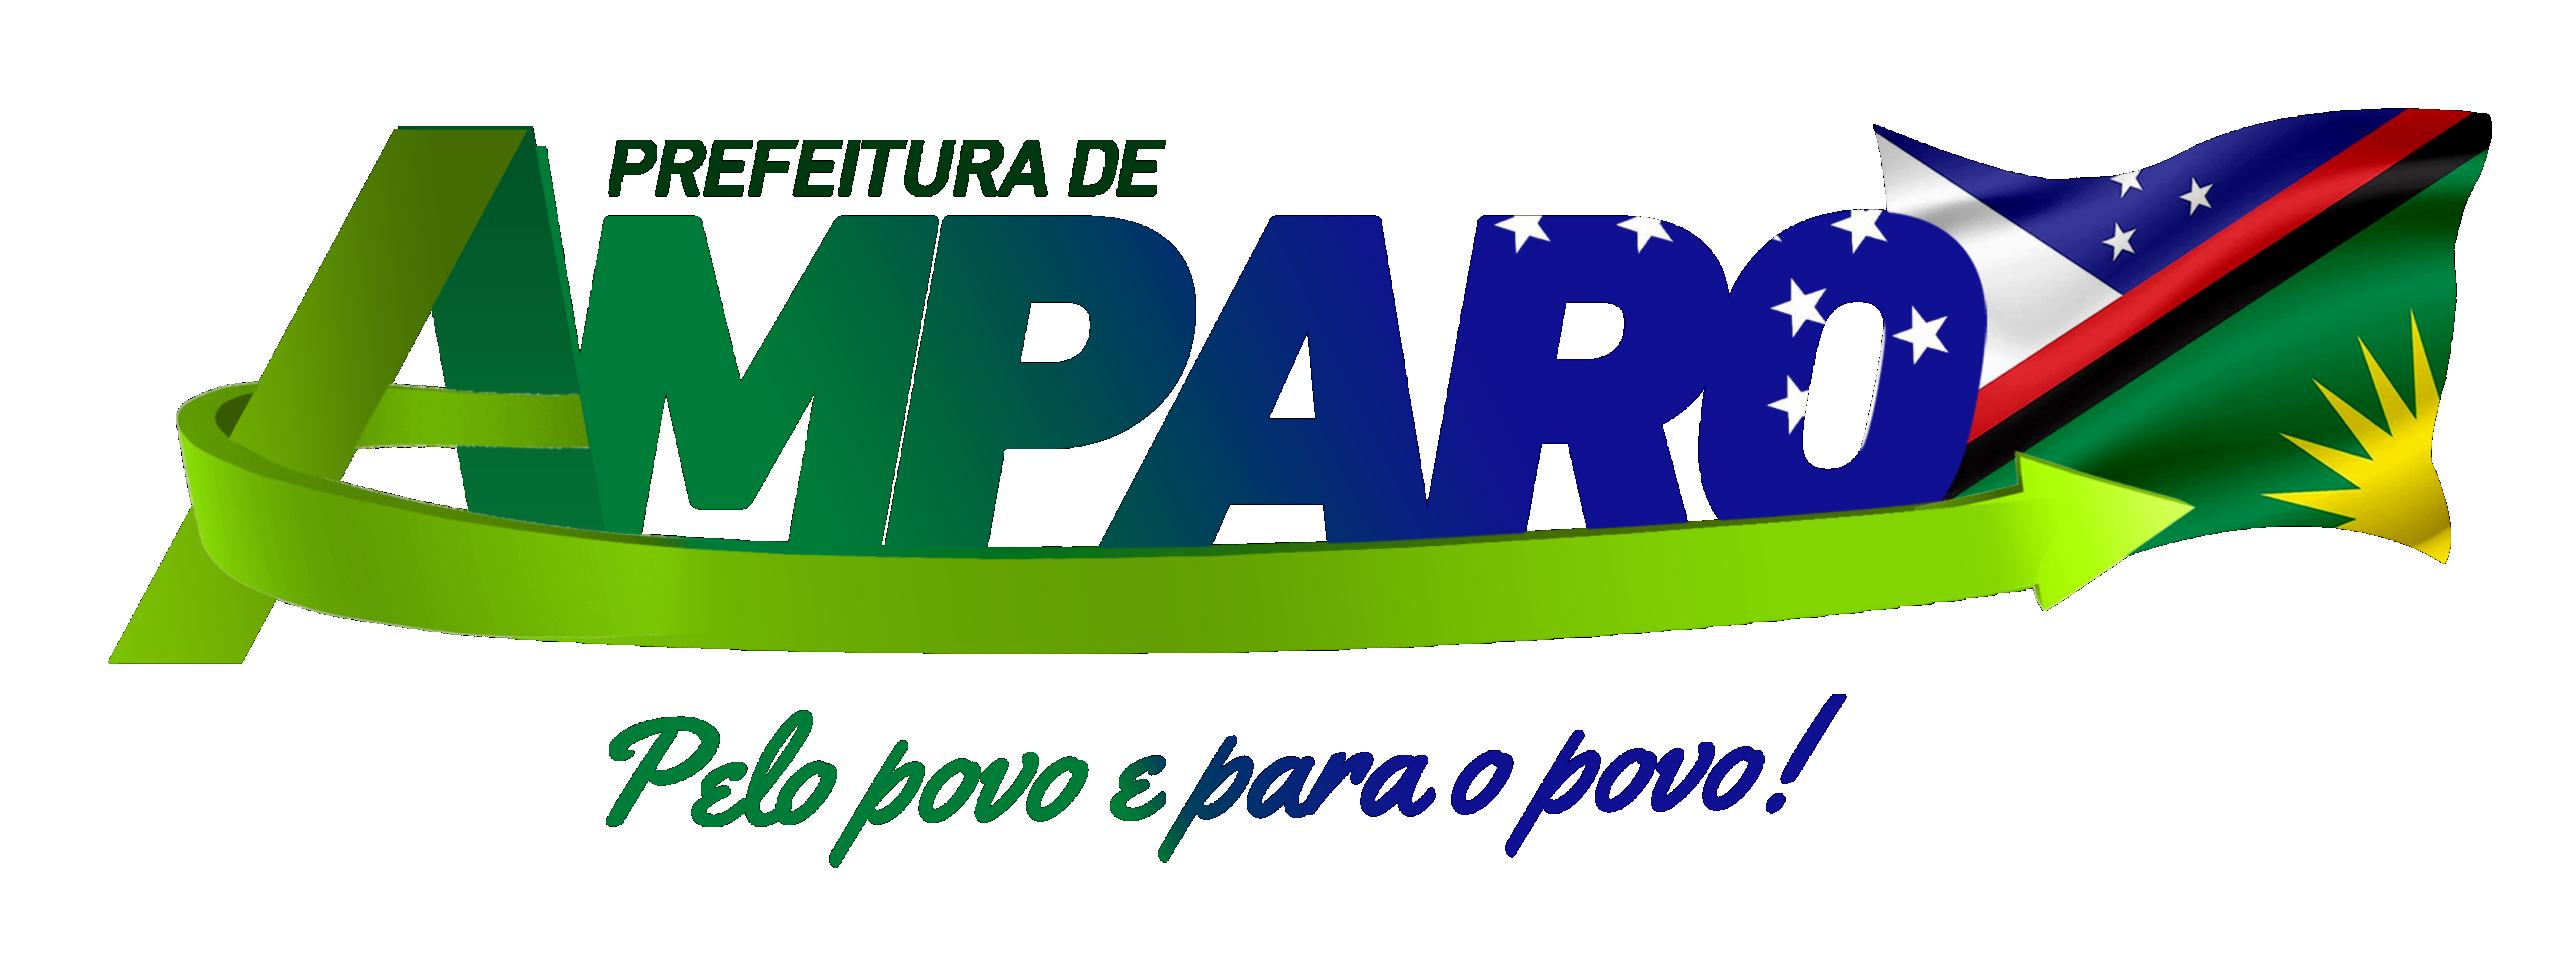 Prefeitura Municipal de Amparo - PB